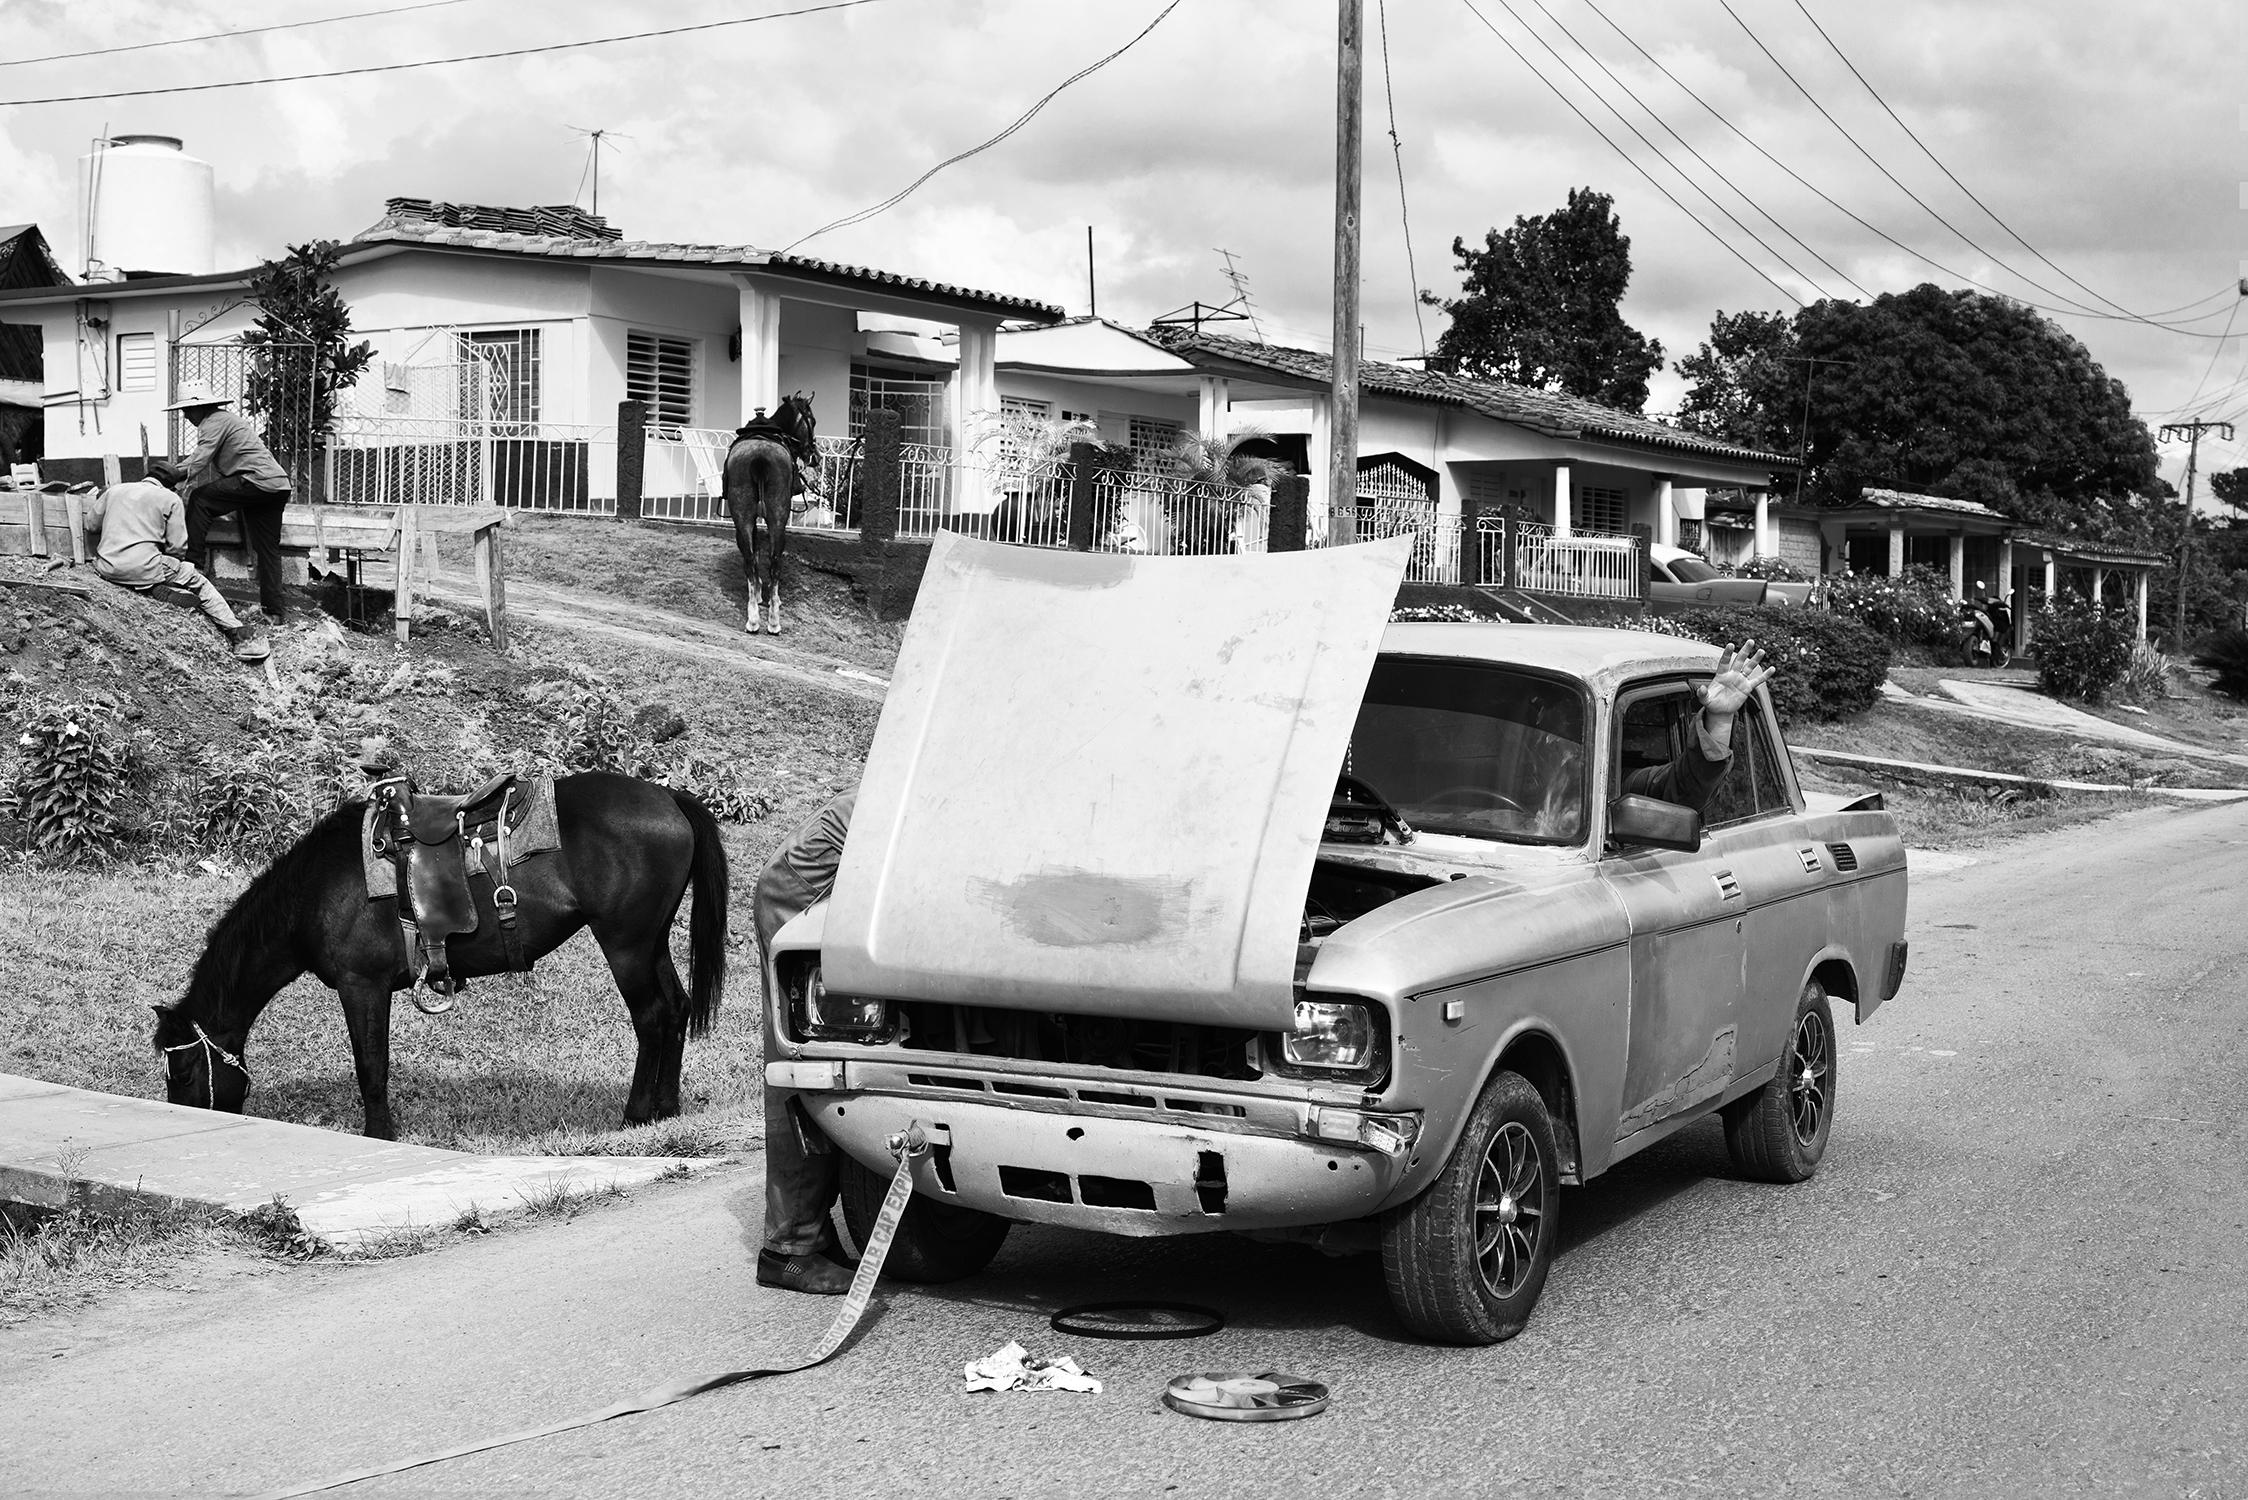 Copy of Havana, Cuba  2018 by Janie Shih